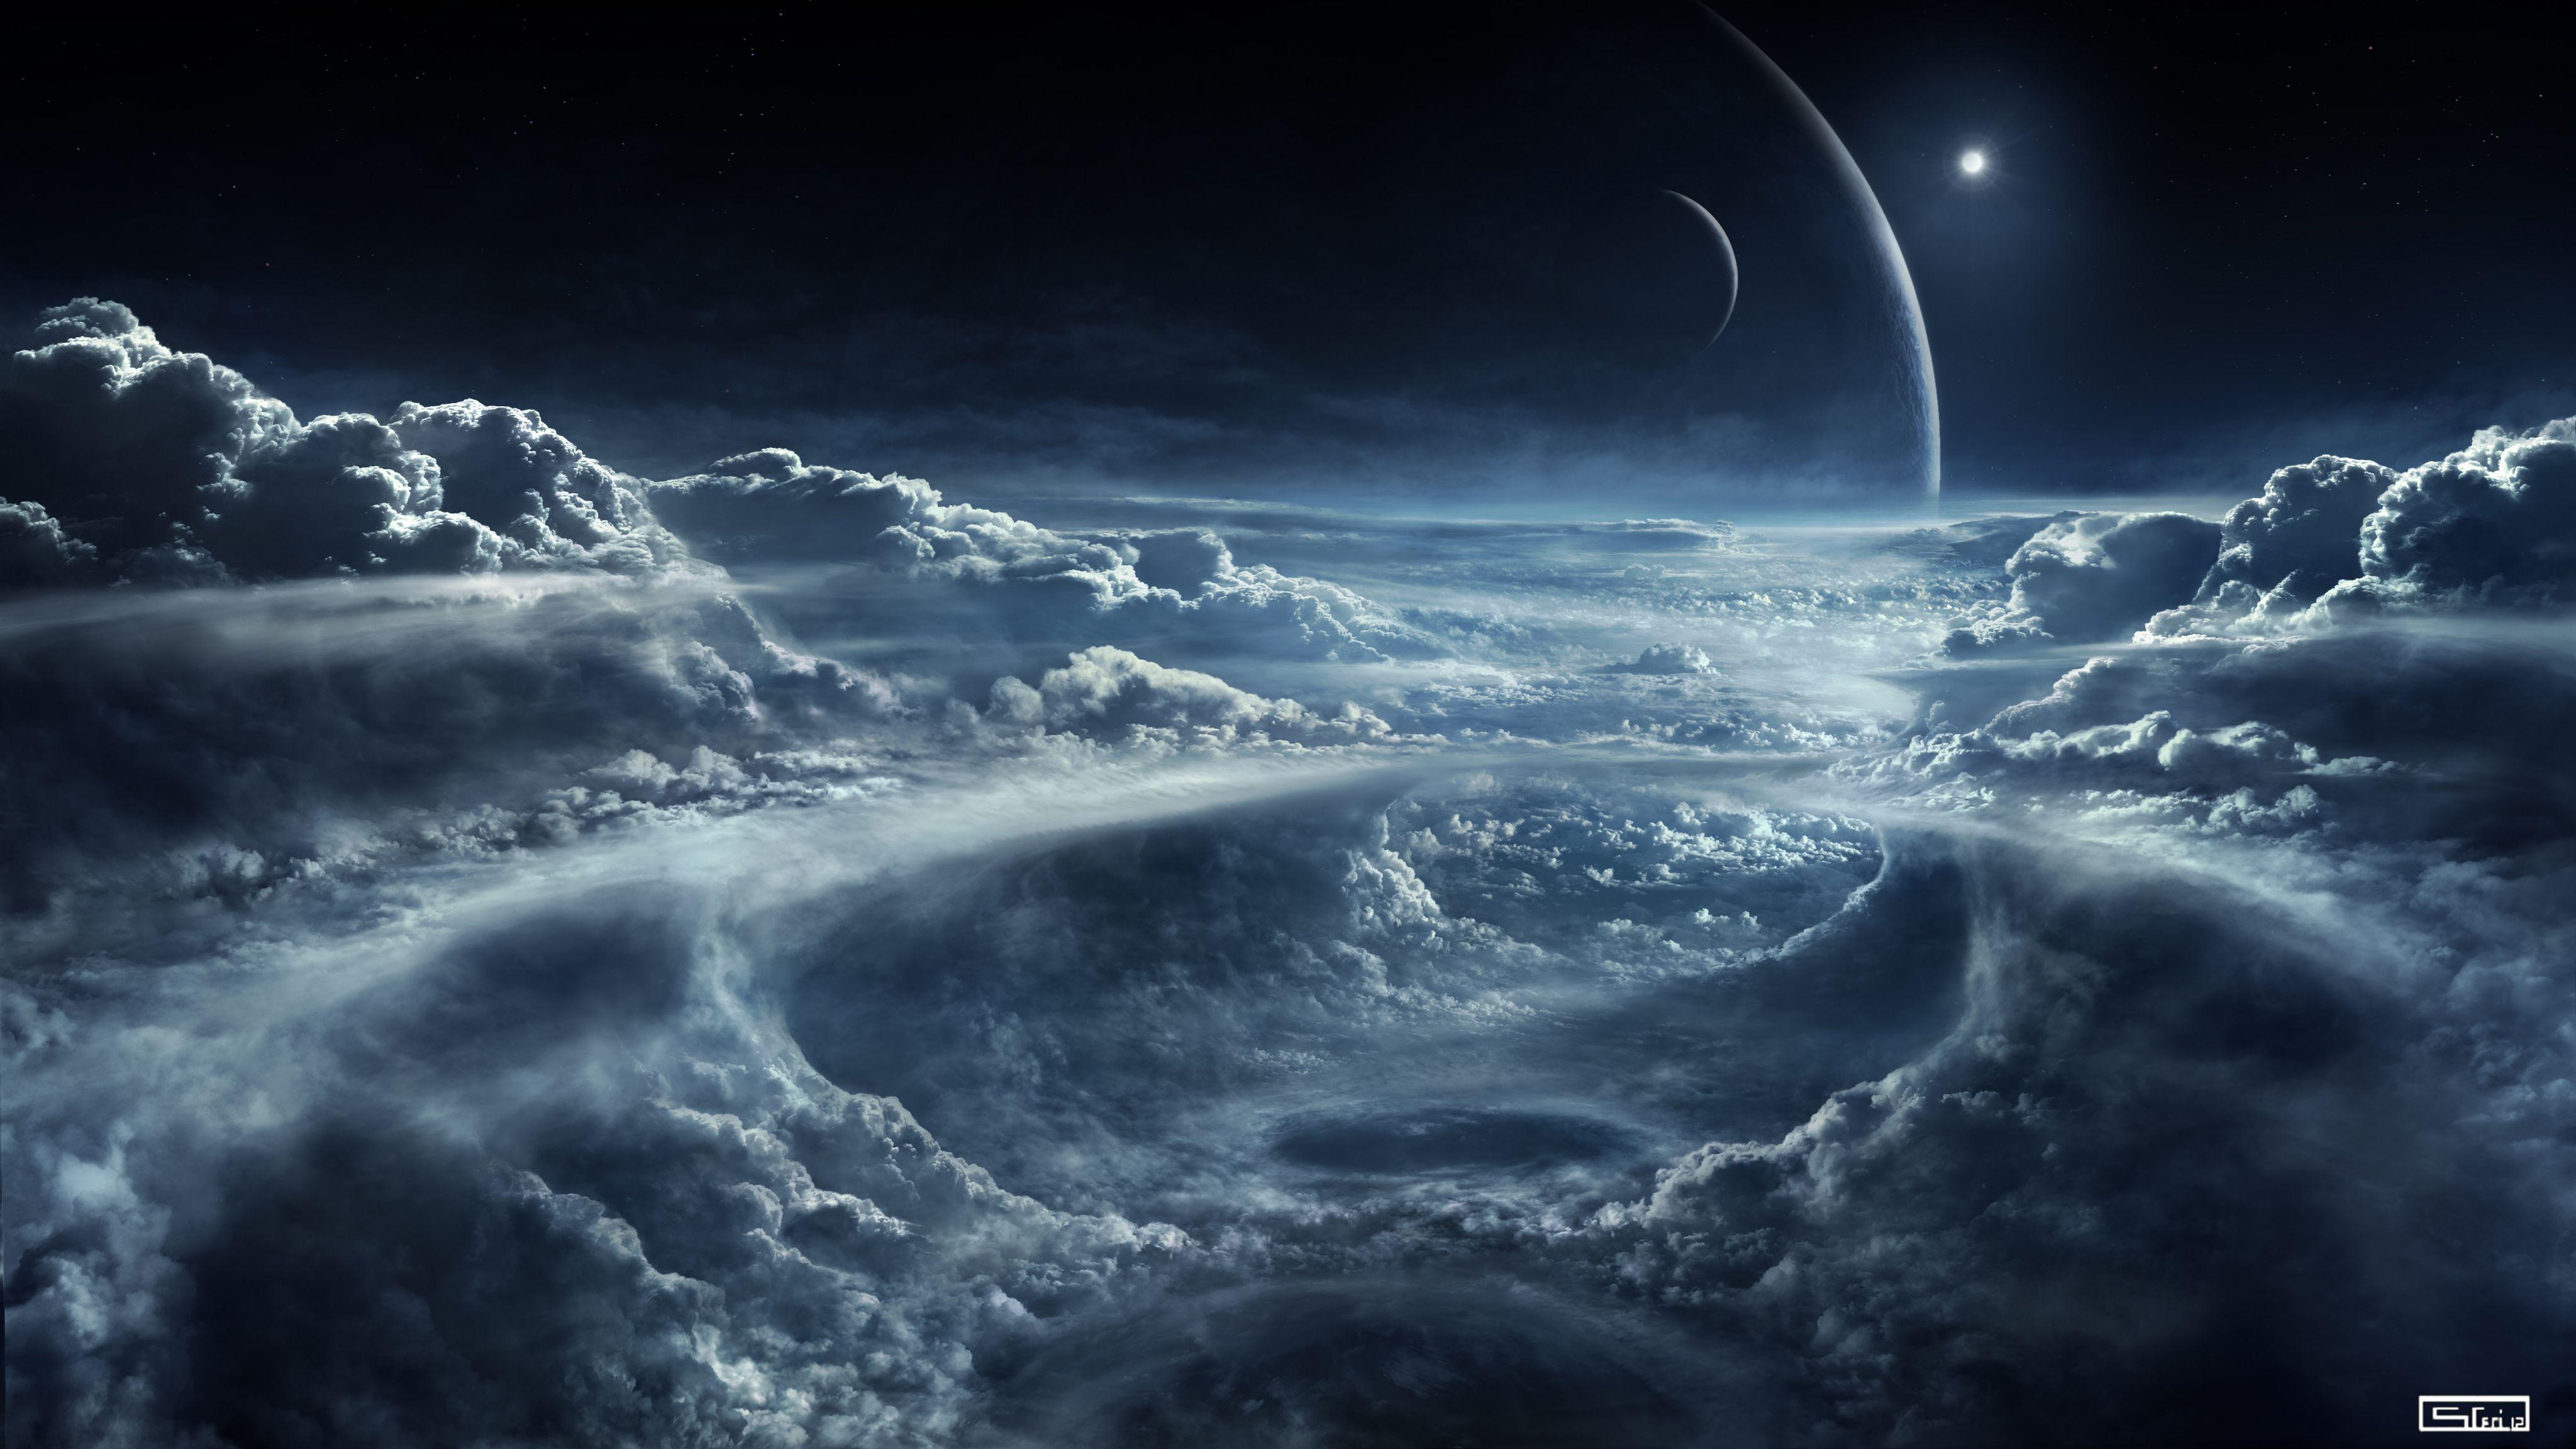 4K Space and Clouds Wallpaper 4K Wallpaper Ultra HD 4K